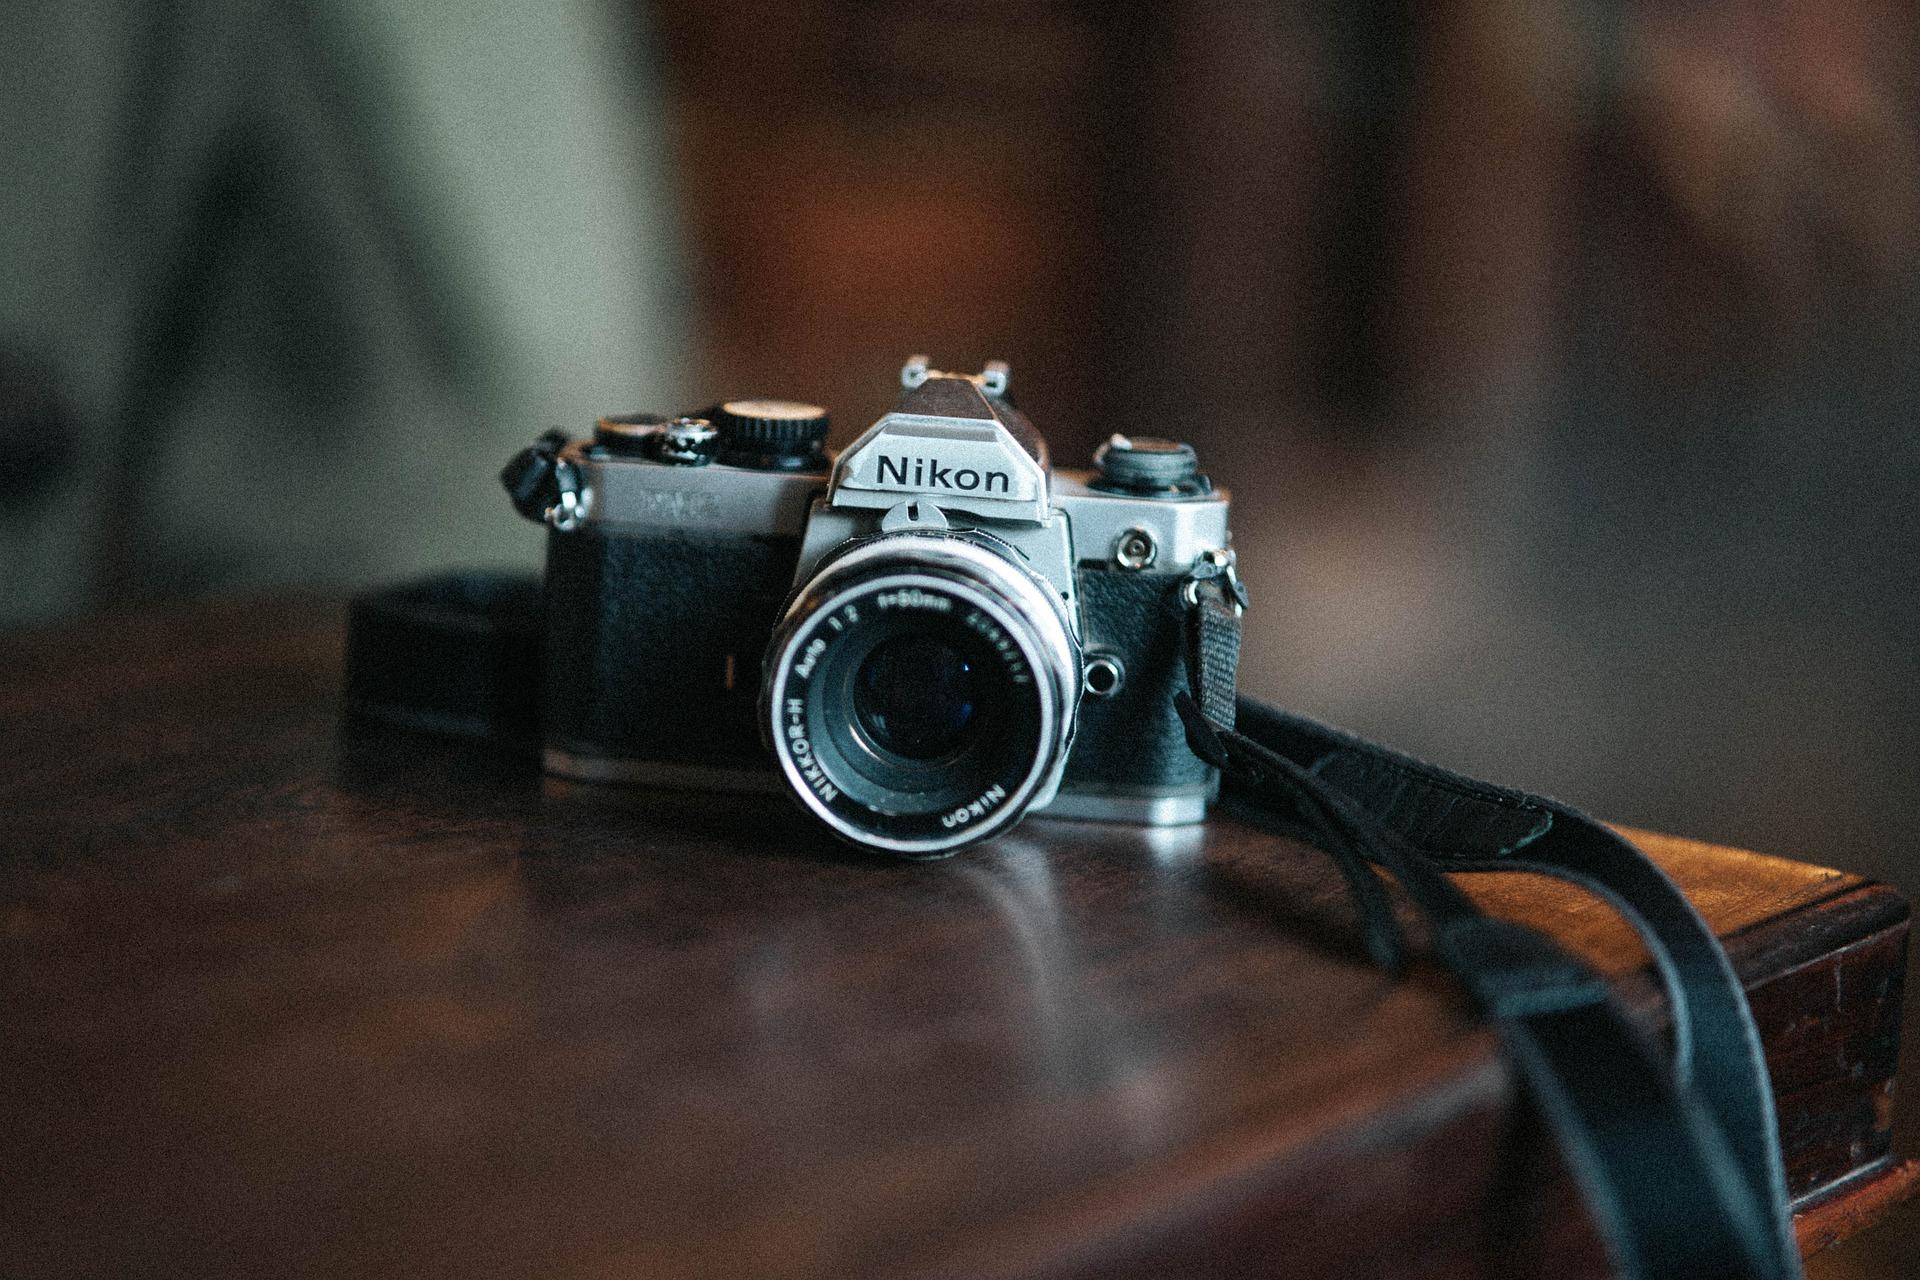 Nikomn film camera (Pic: Thuan Vo/Pixabay)